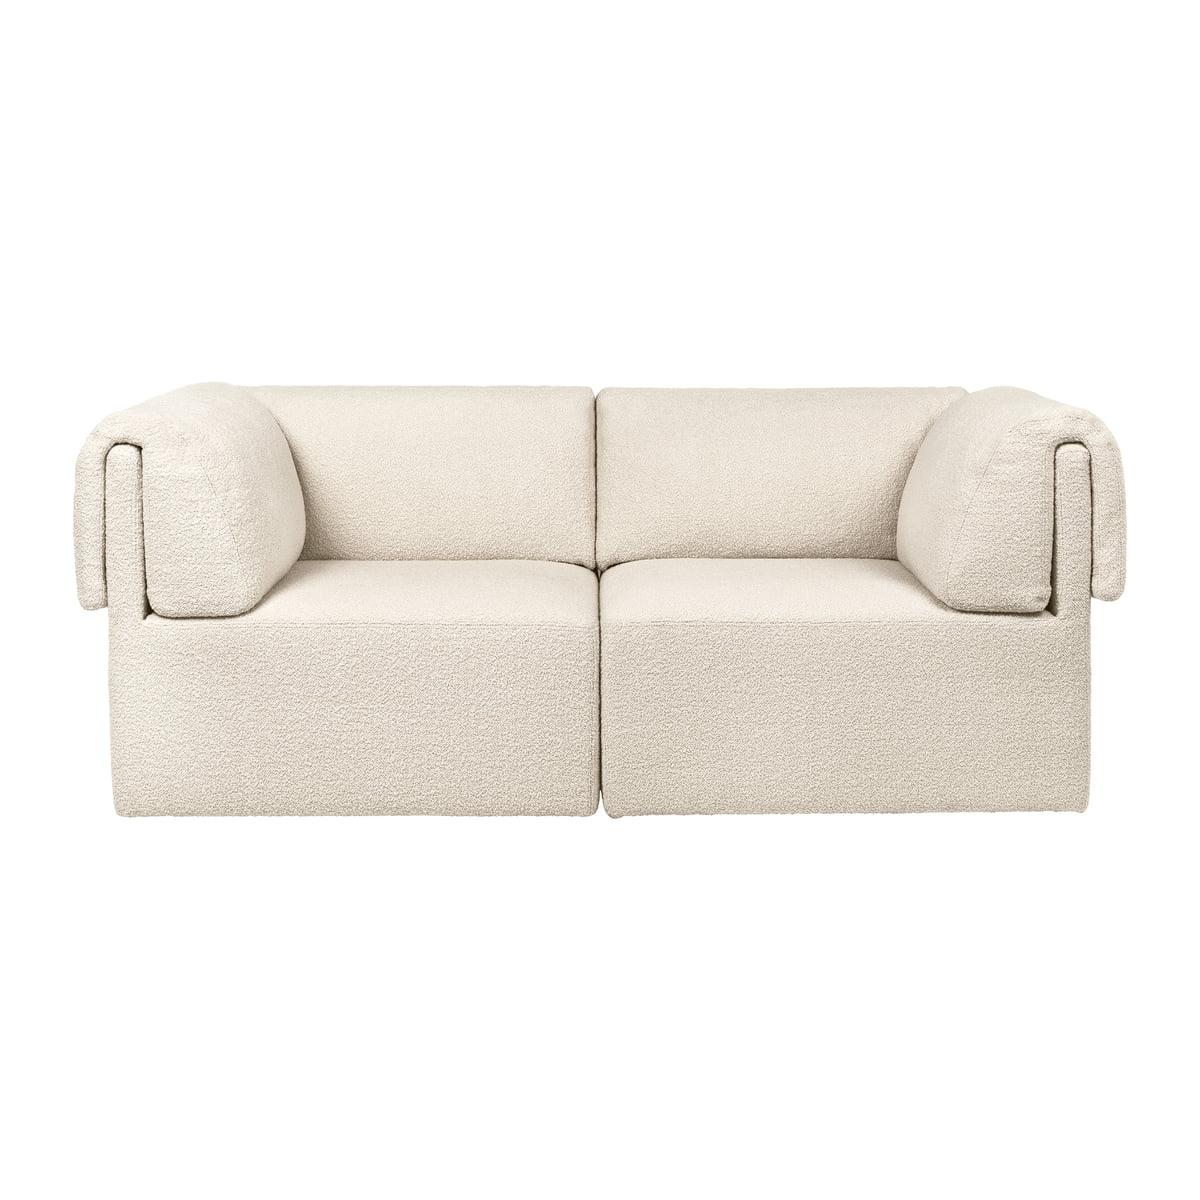 Gubi - Wonder Sofa, 2-Sitzer, Karakorum 001 créme